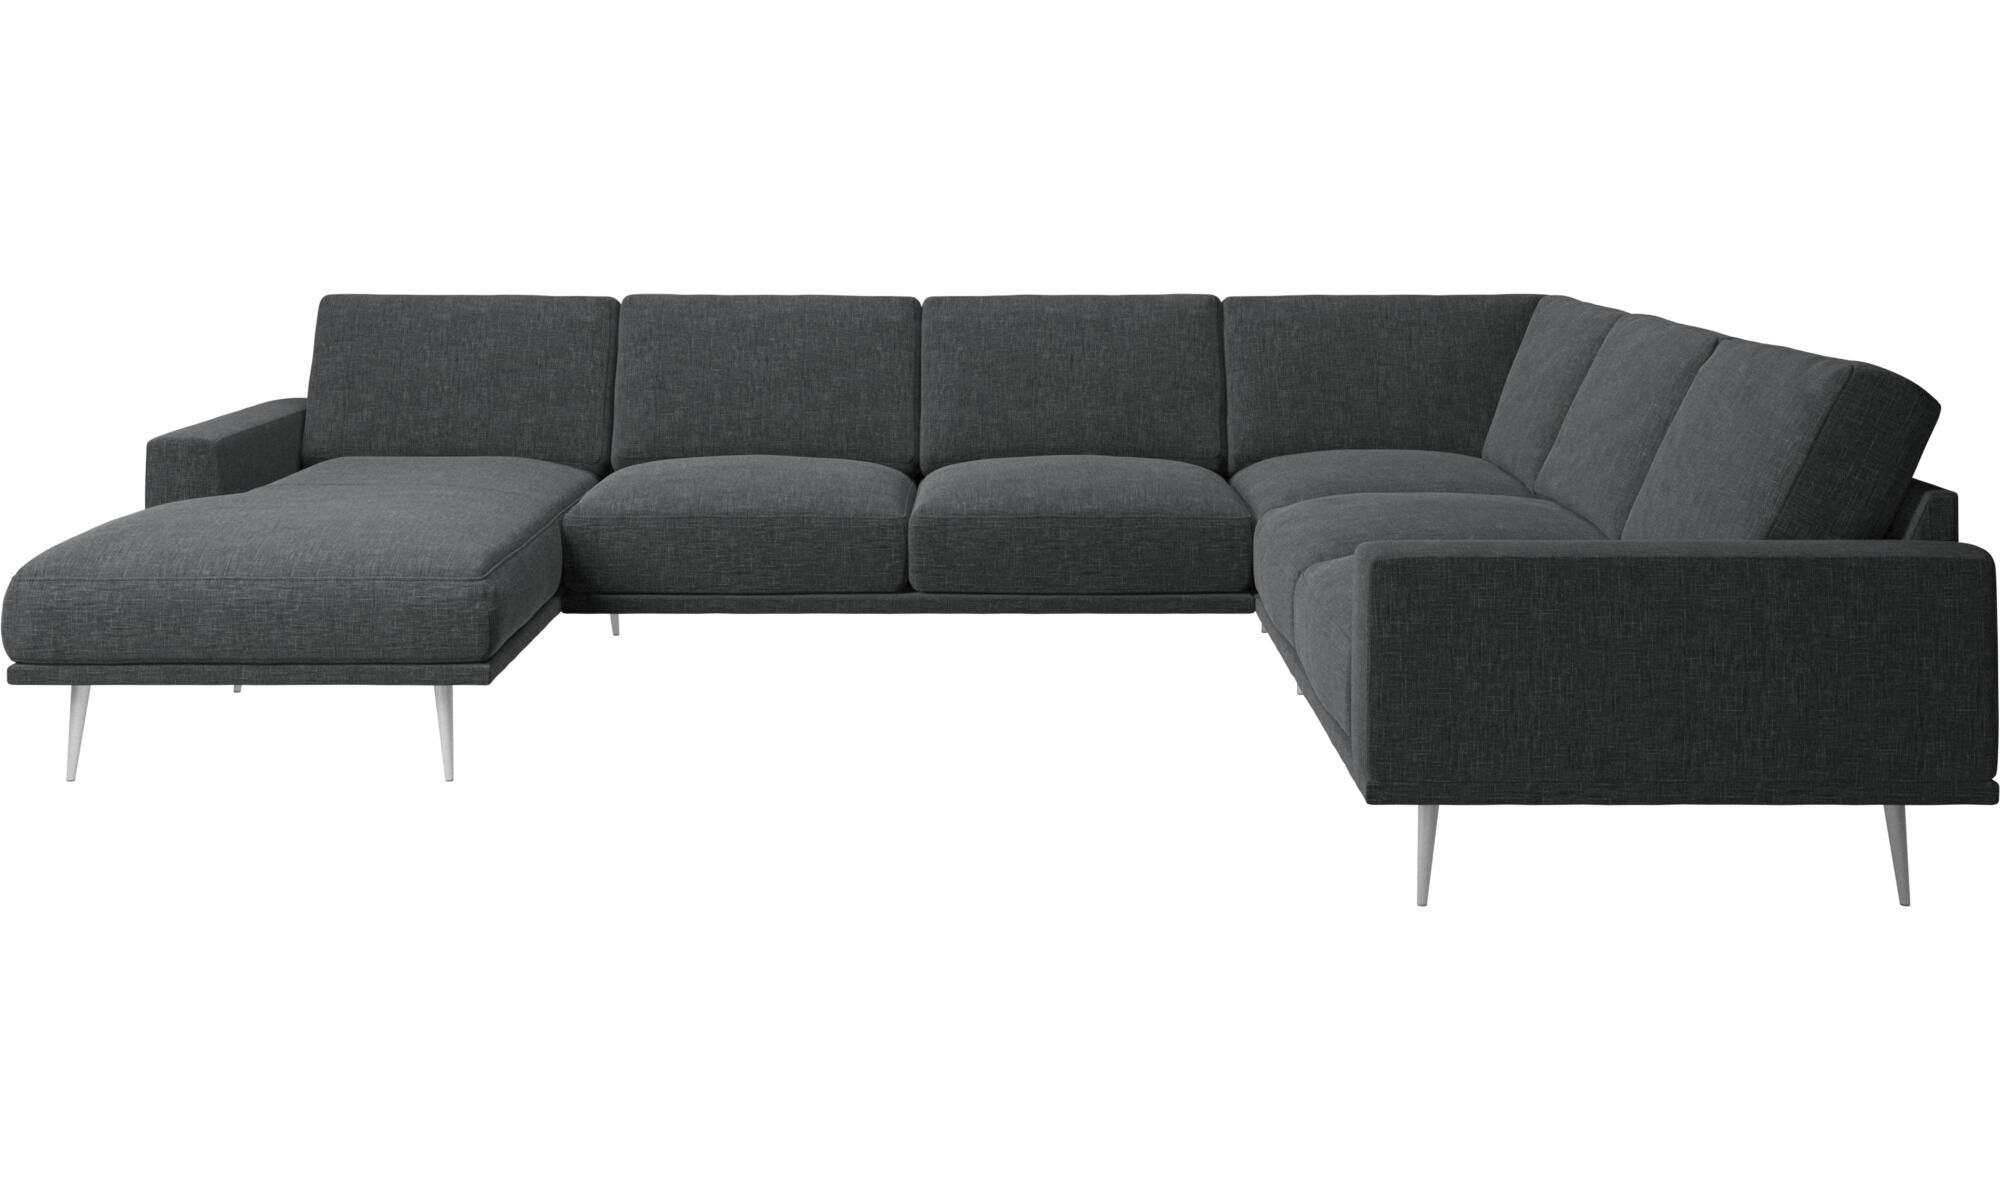 Chaise lounge sofas Carlton corner sofa with resting unit BoConcept